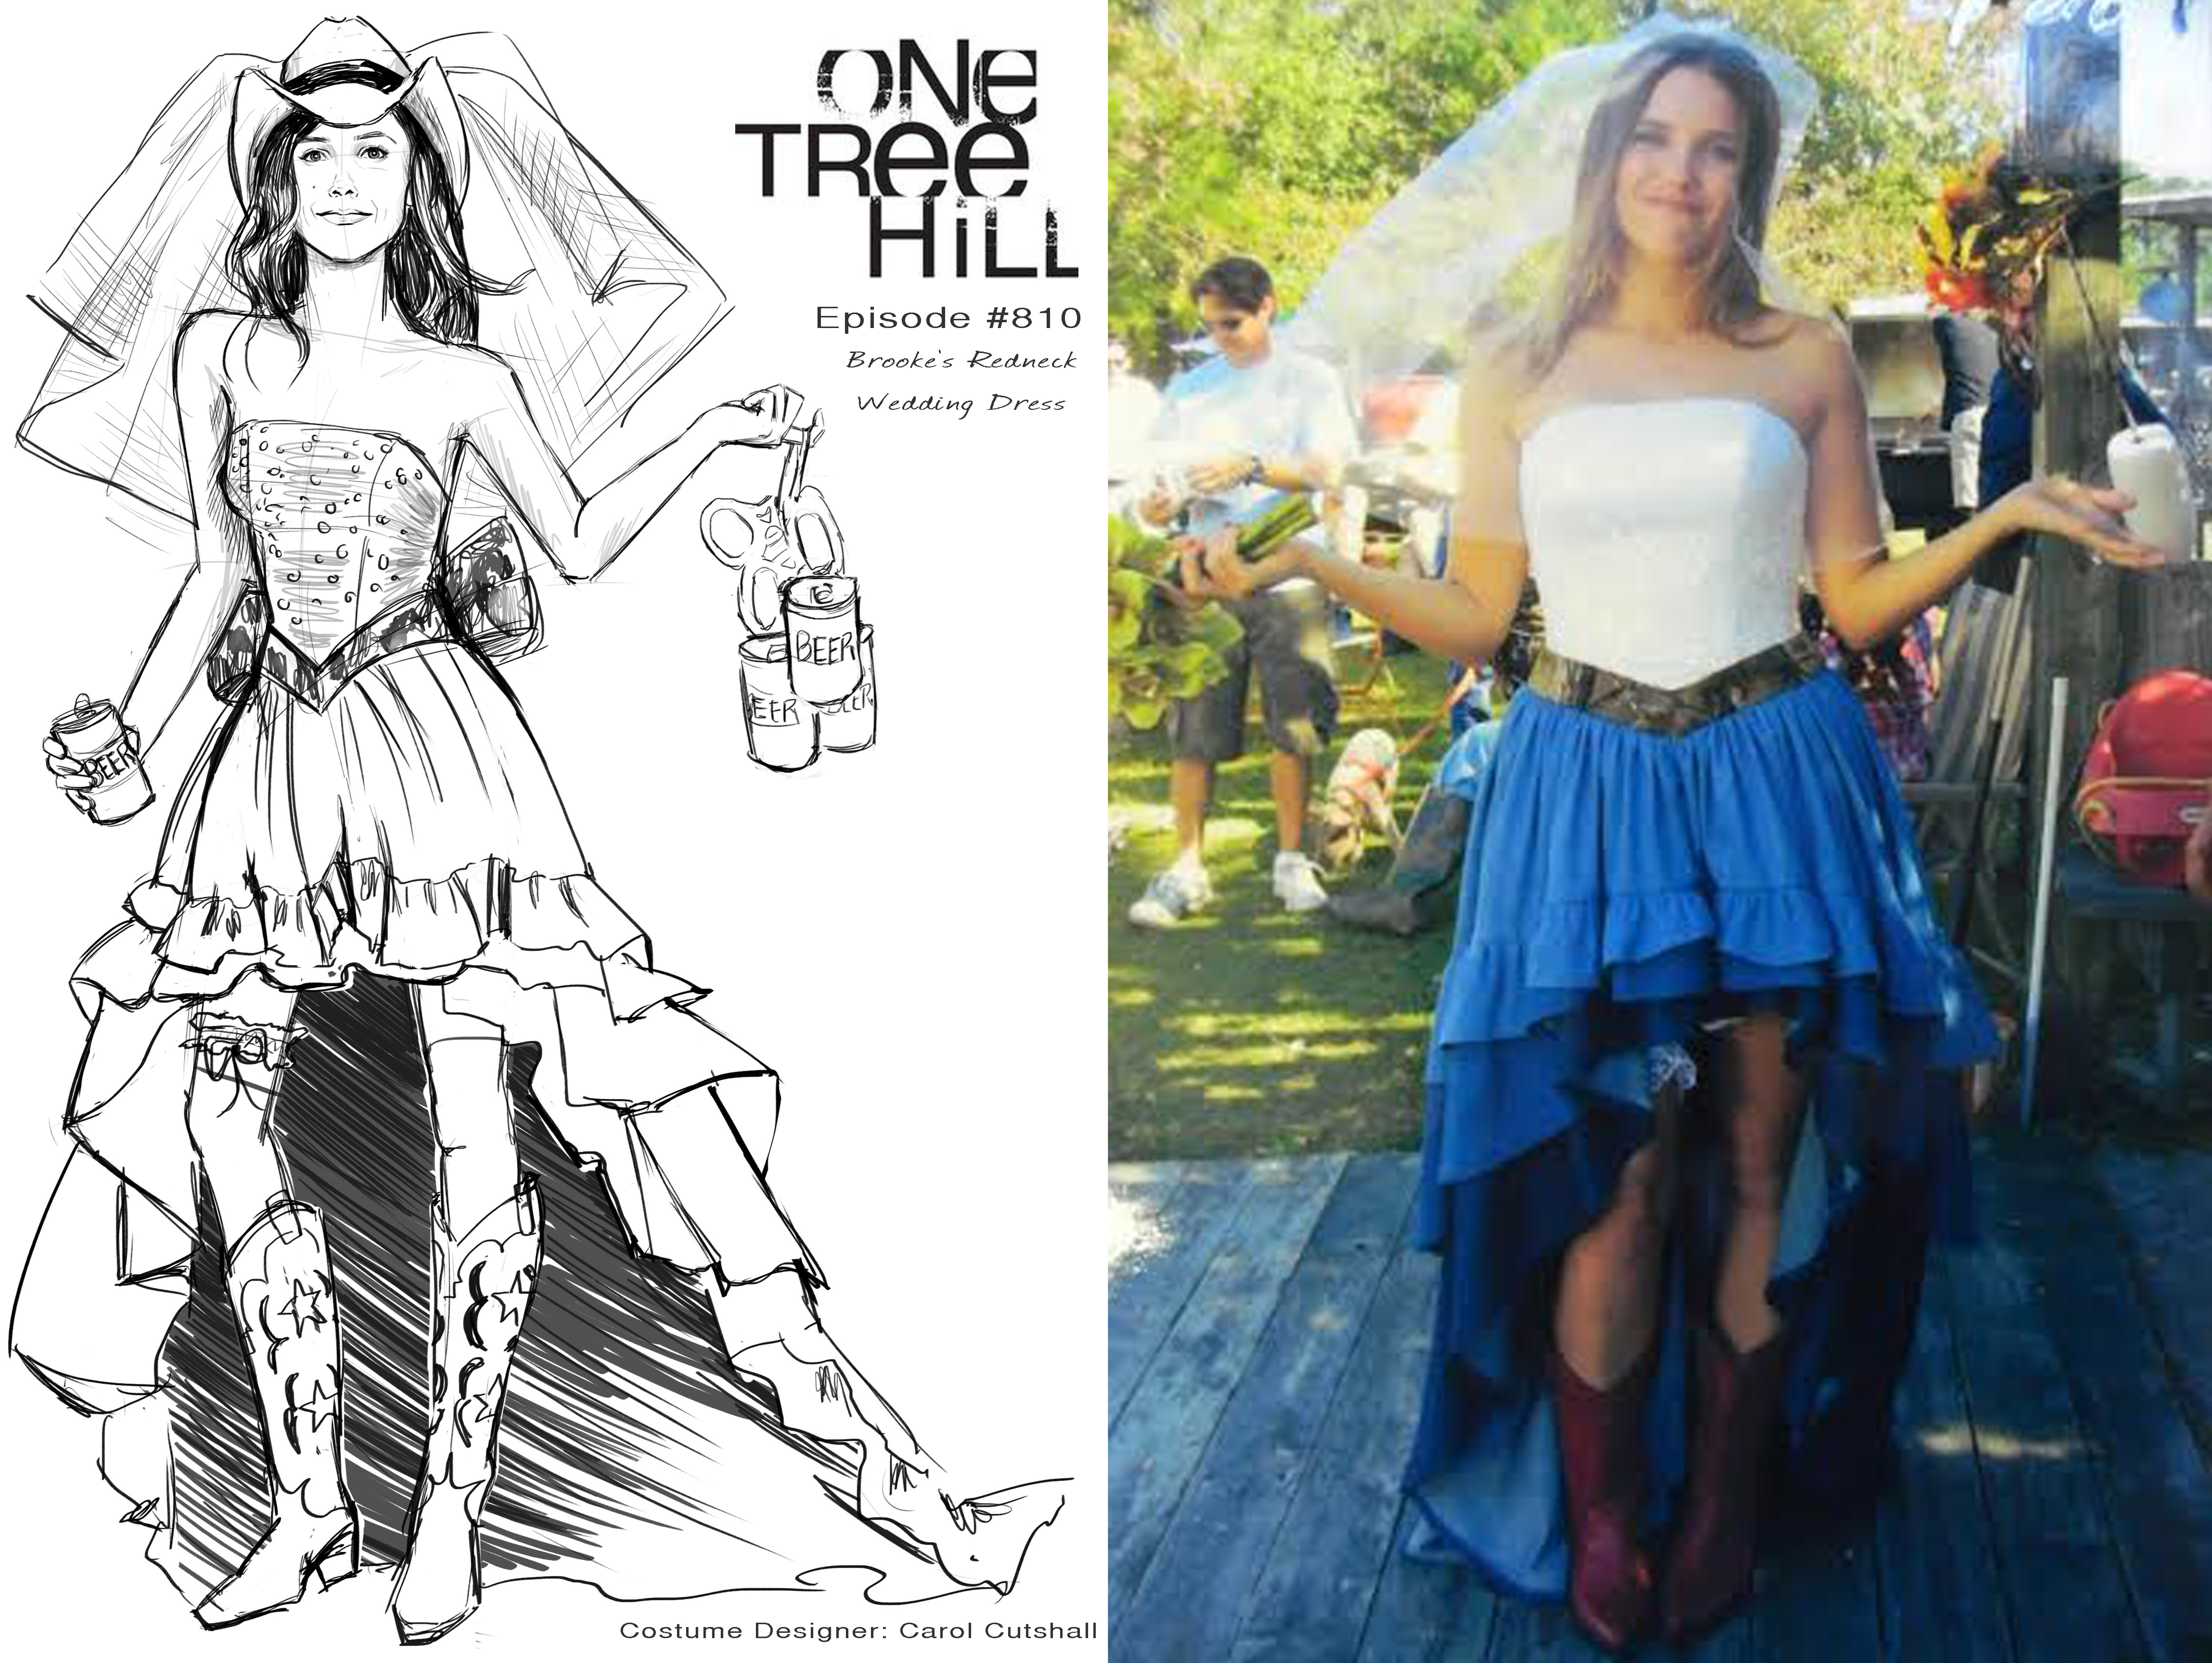 Hillbilly Wedding Dress